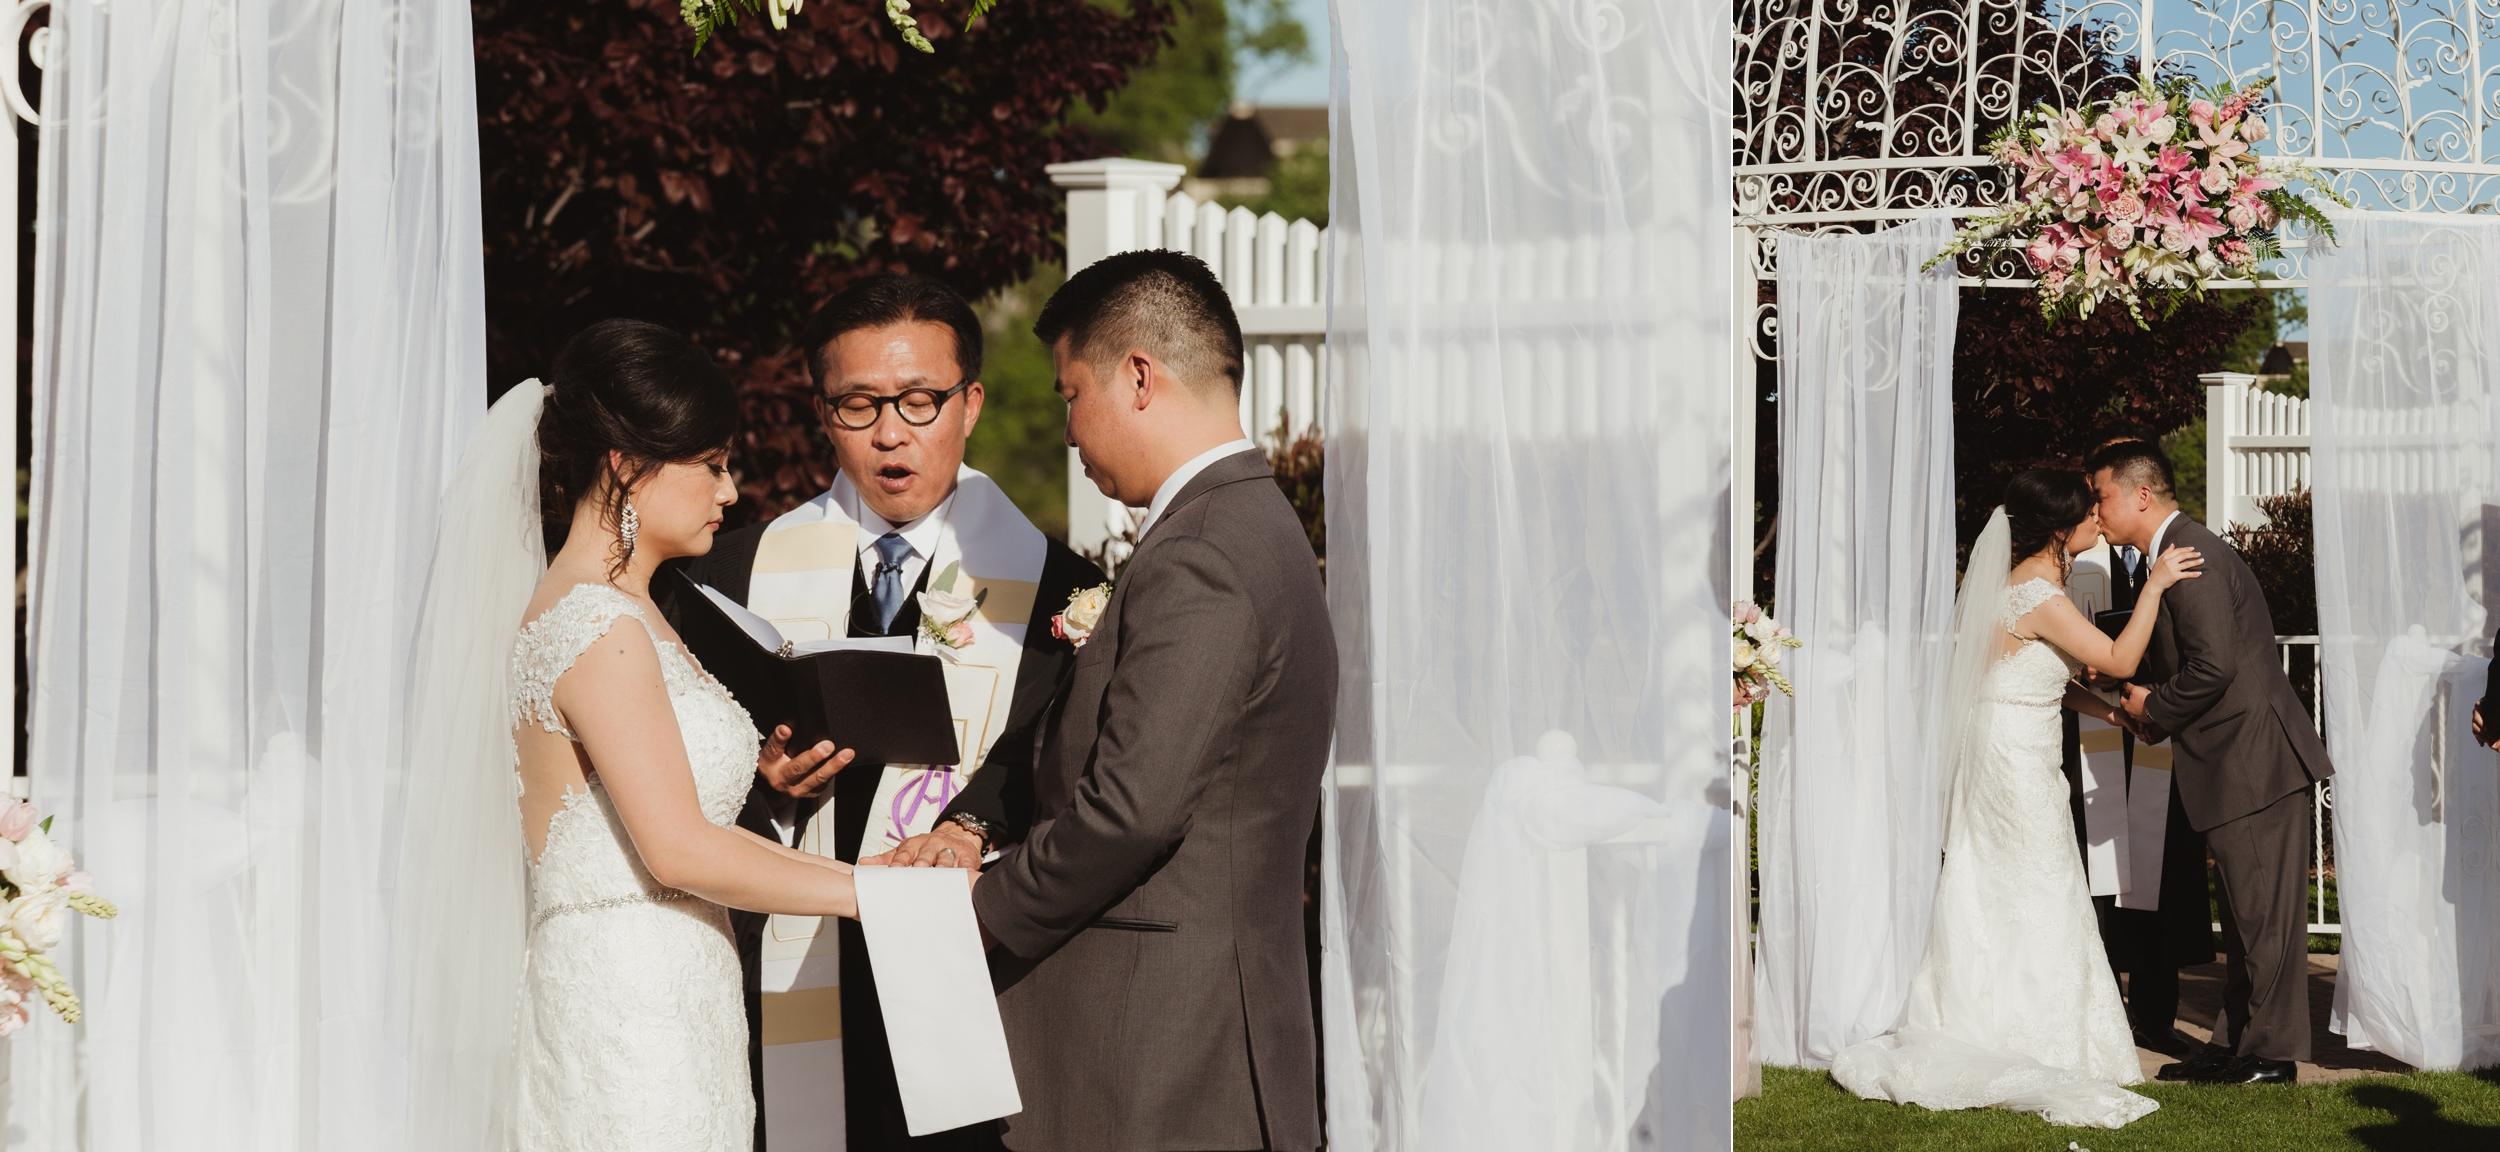 20-saratoga-country-club-wedding-vivianchen-277_WEB.jpg